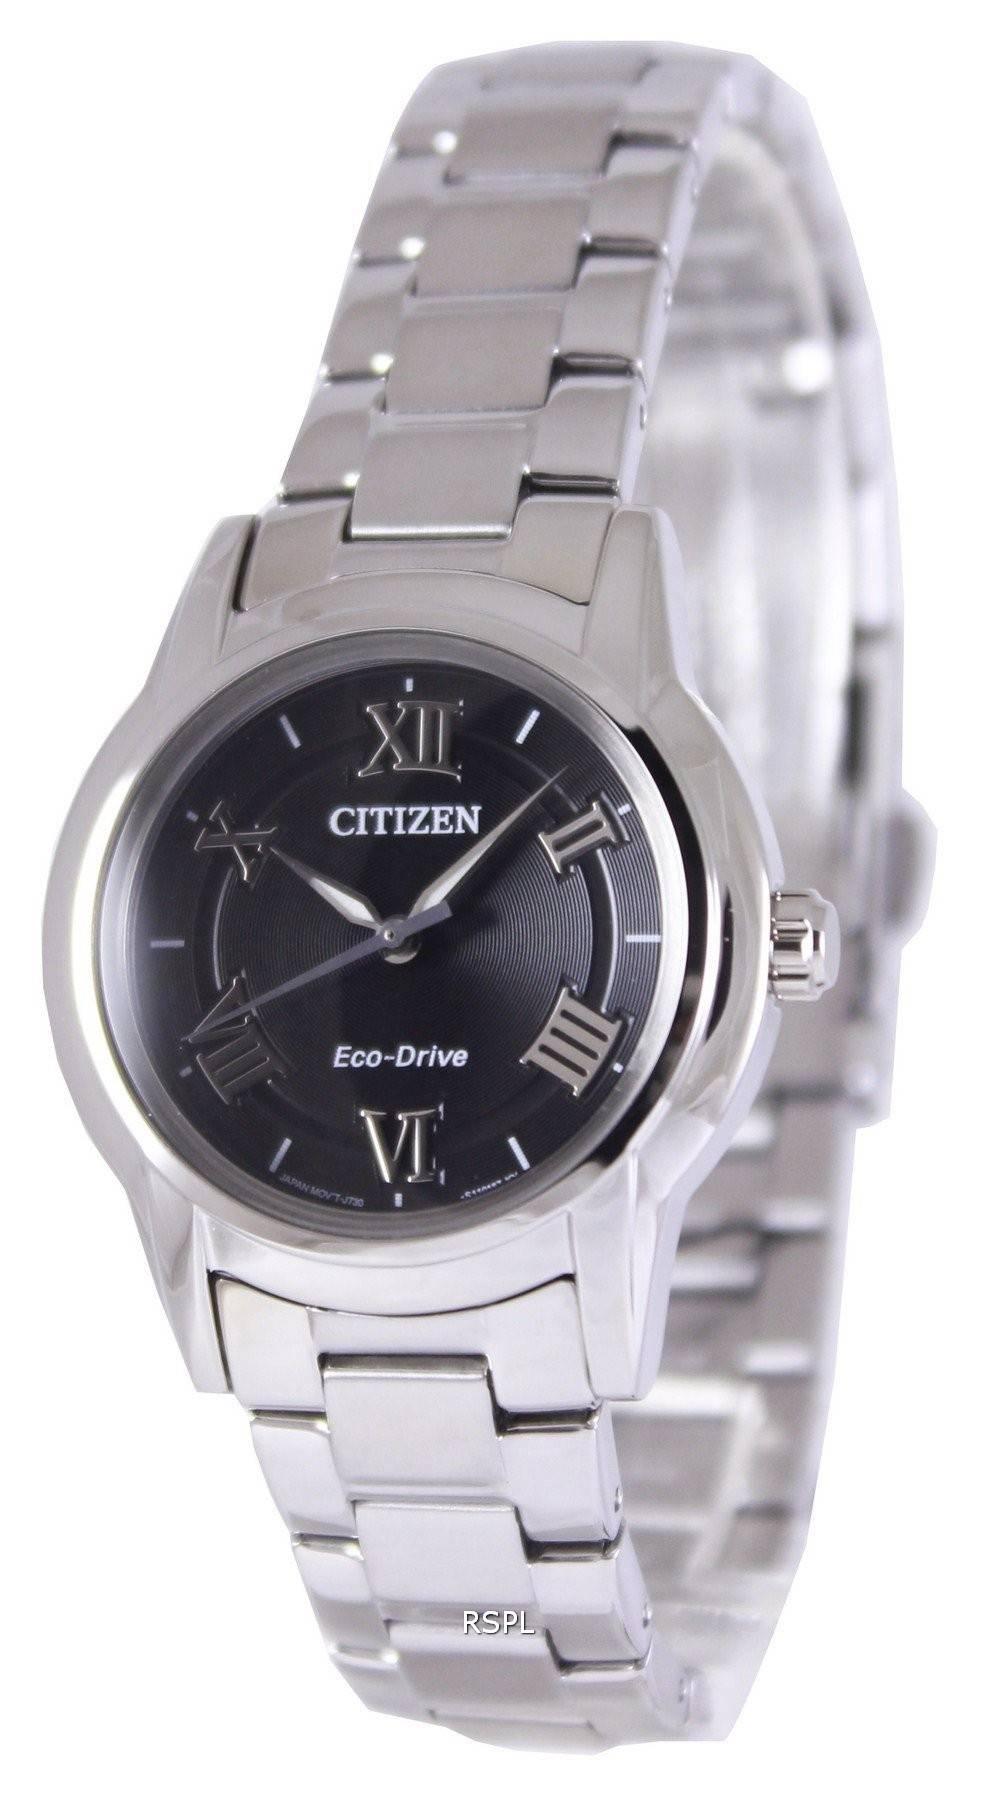 Citizen Watches - Macy's